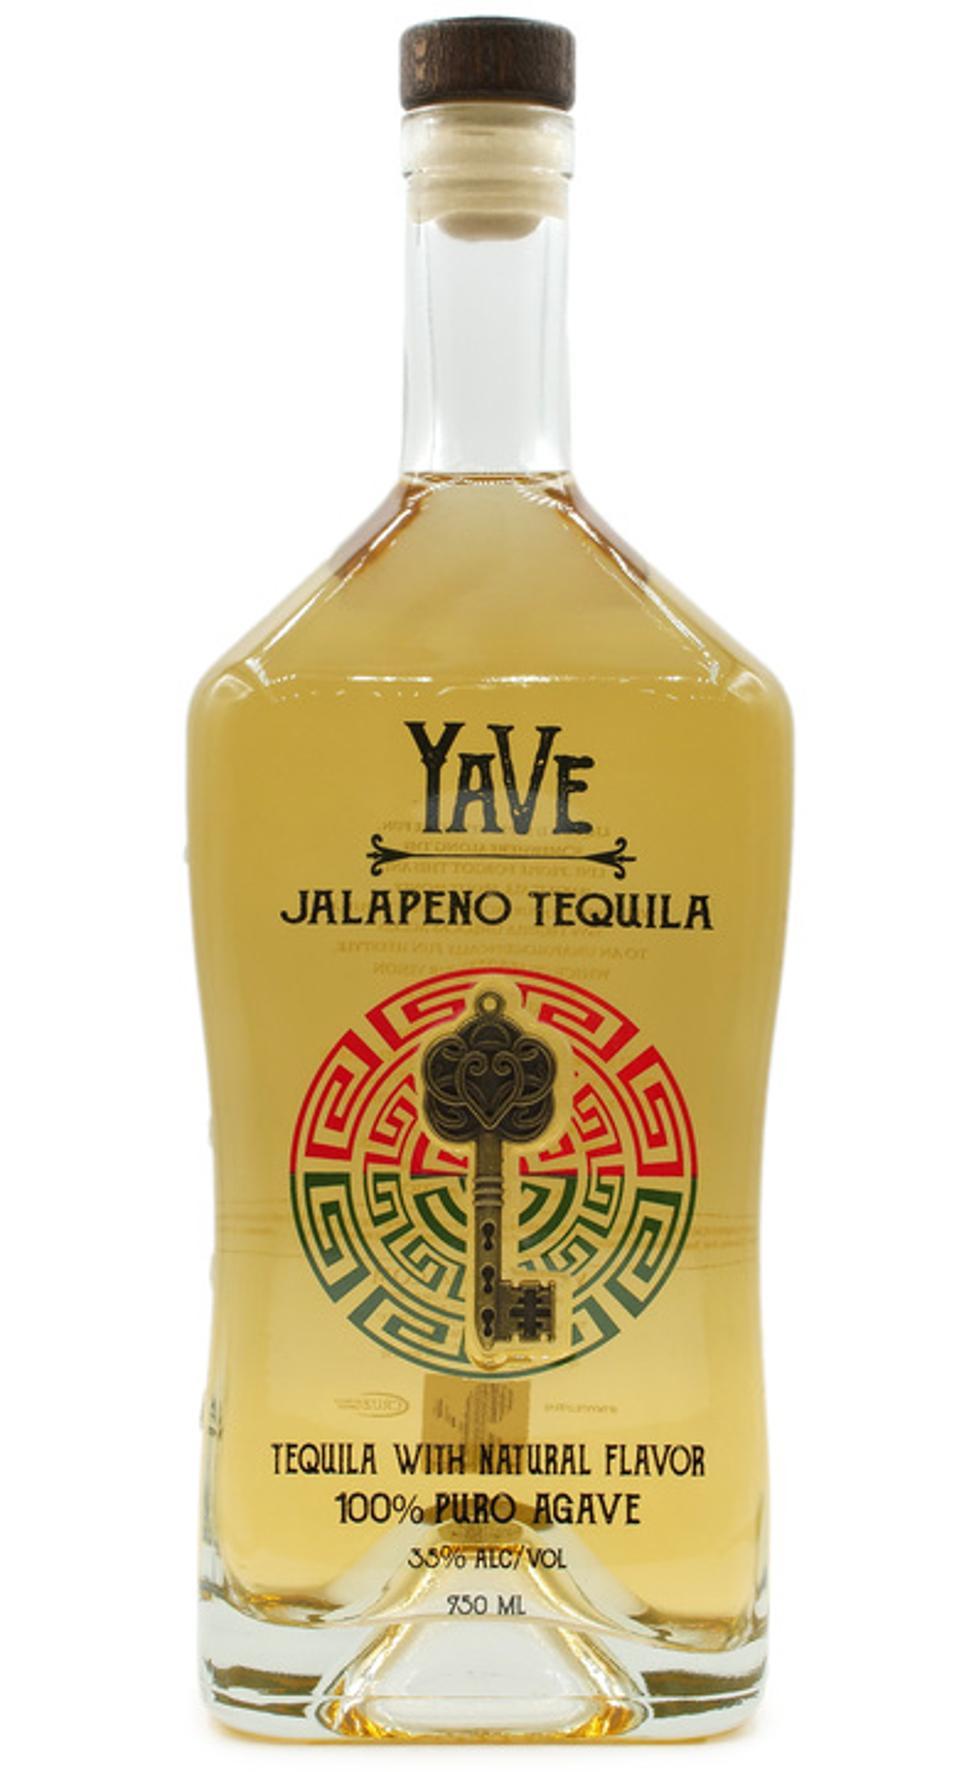 YaVe Jalapeno Infused Reposado Tequila